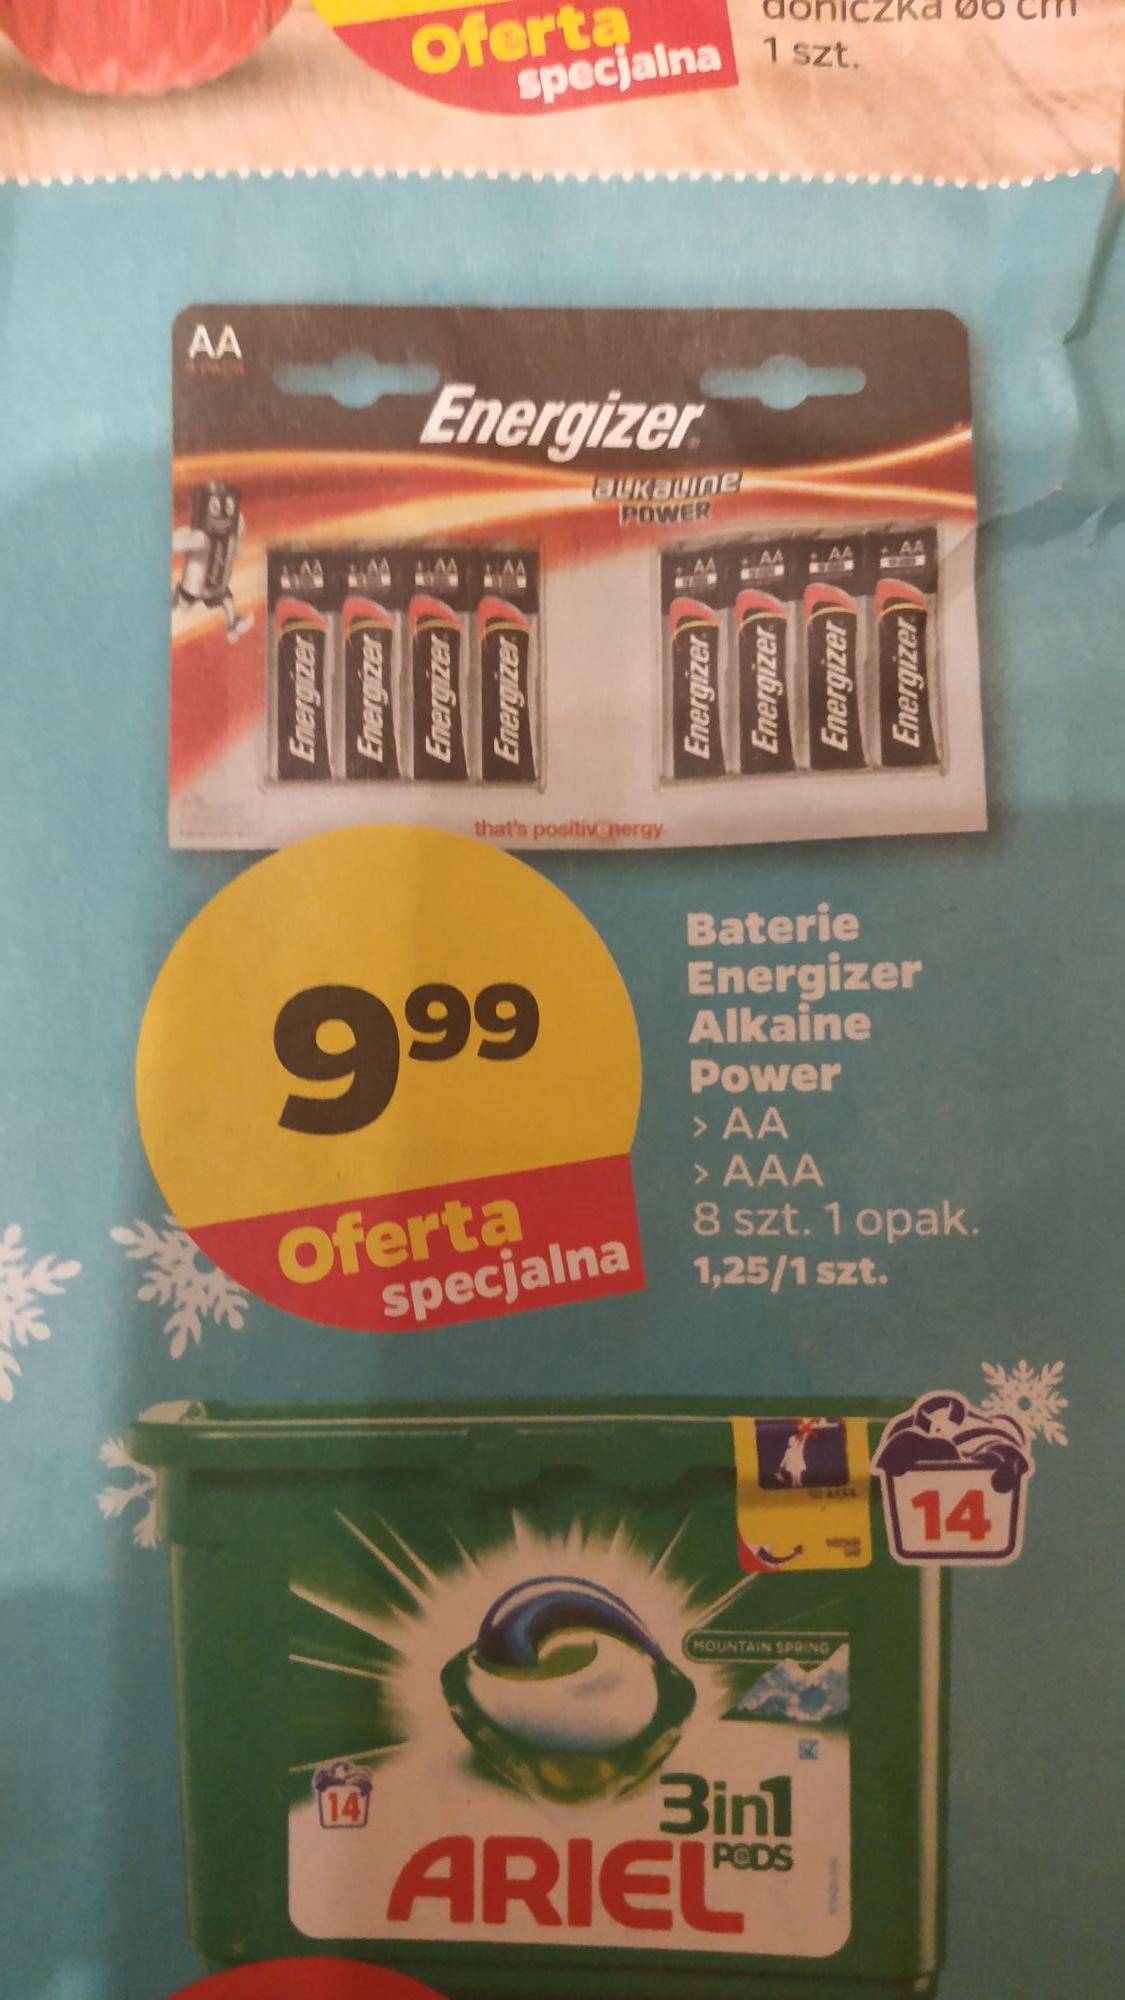 Baterie Energizer Alkaine Power AA/AAA